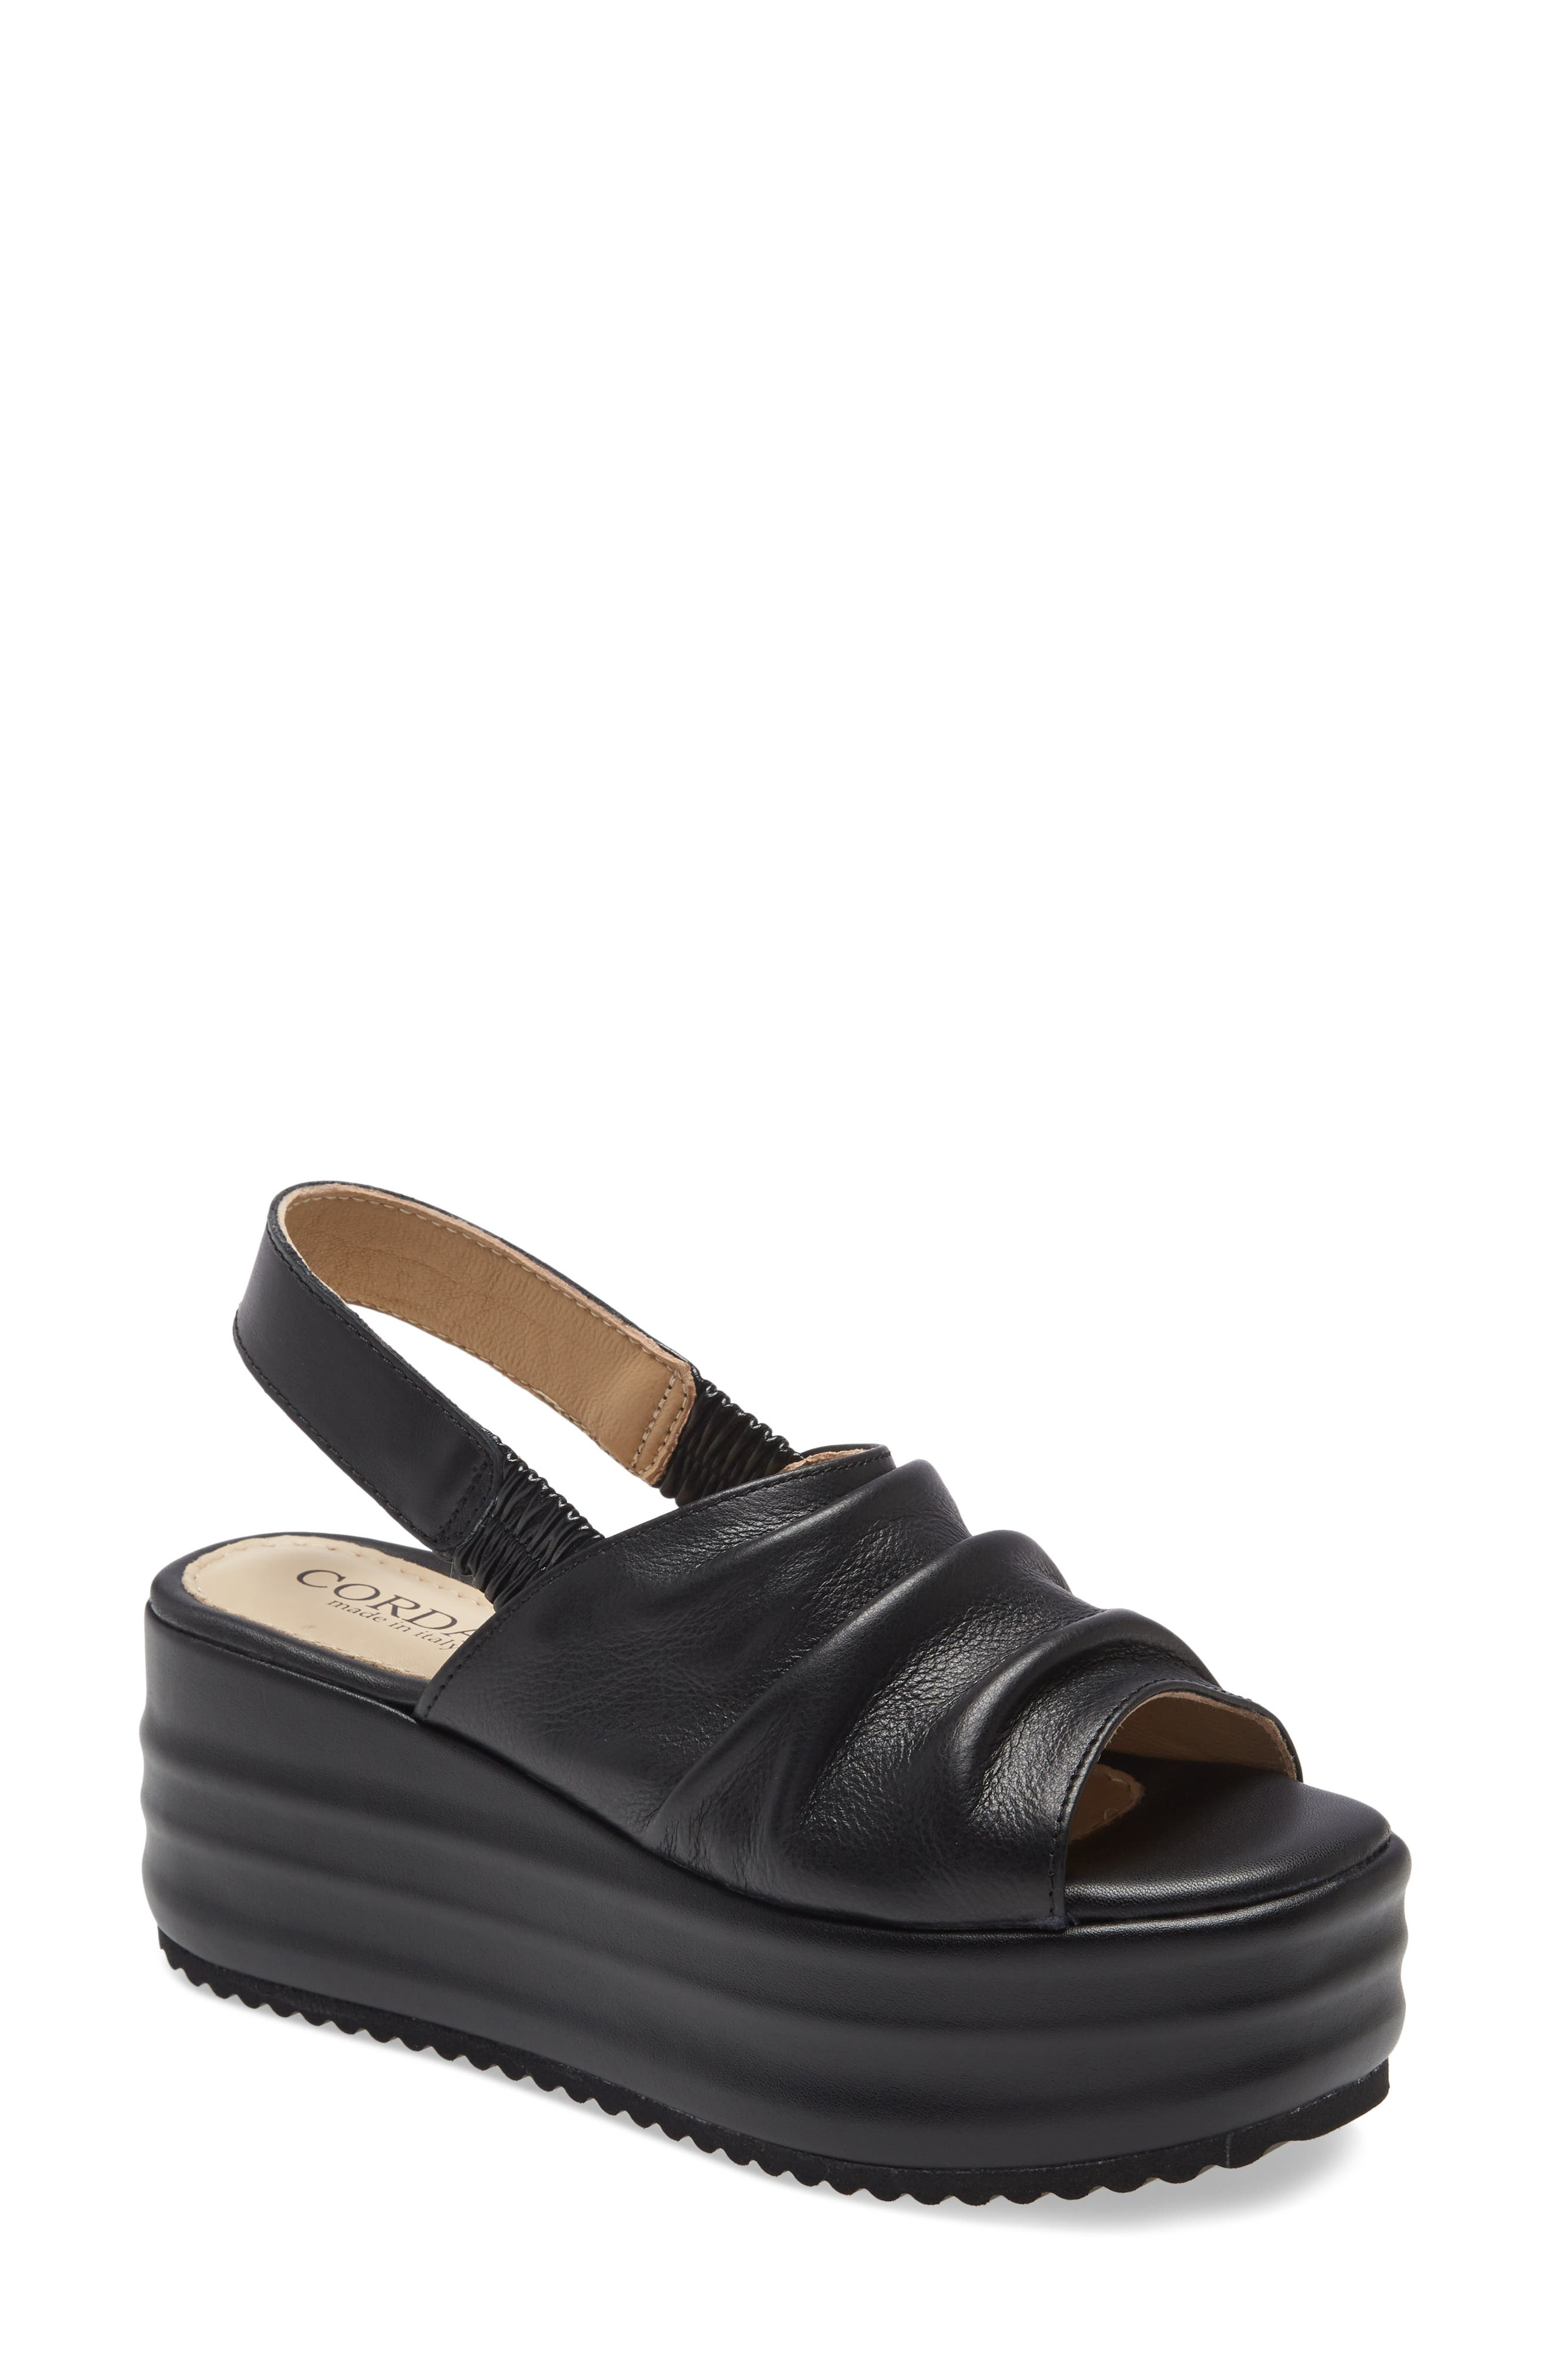 Yorkie Platform Wedge Slingback Sandal